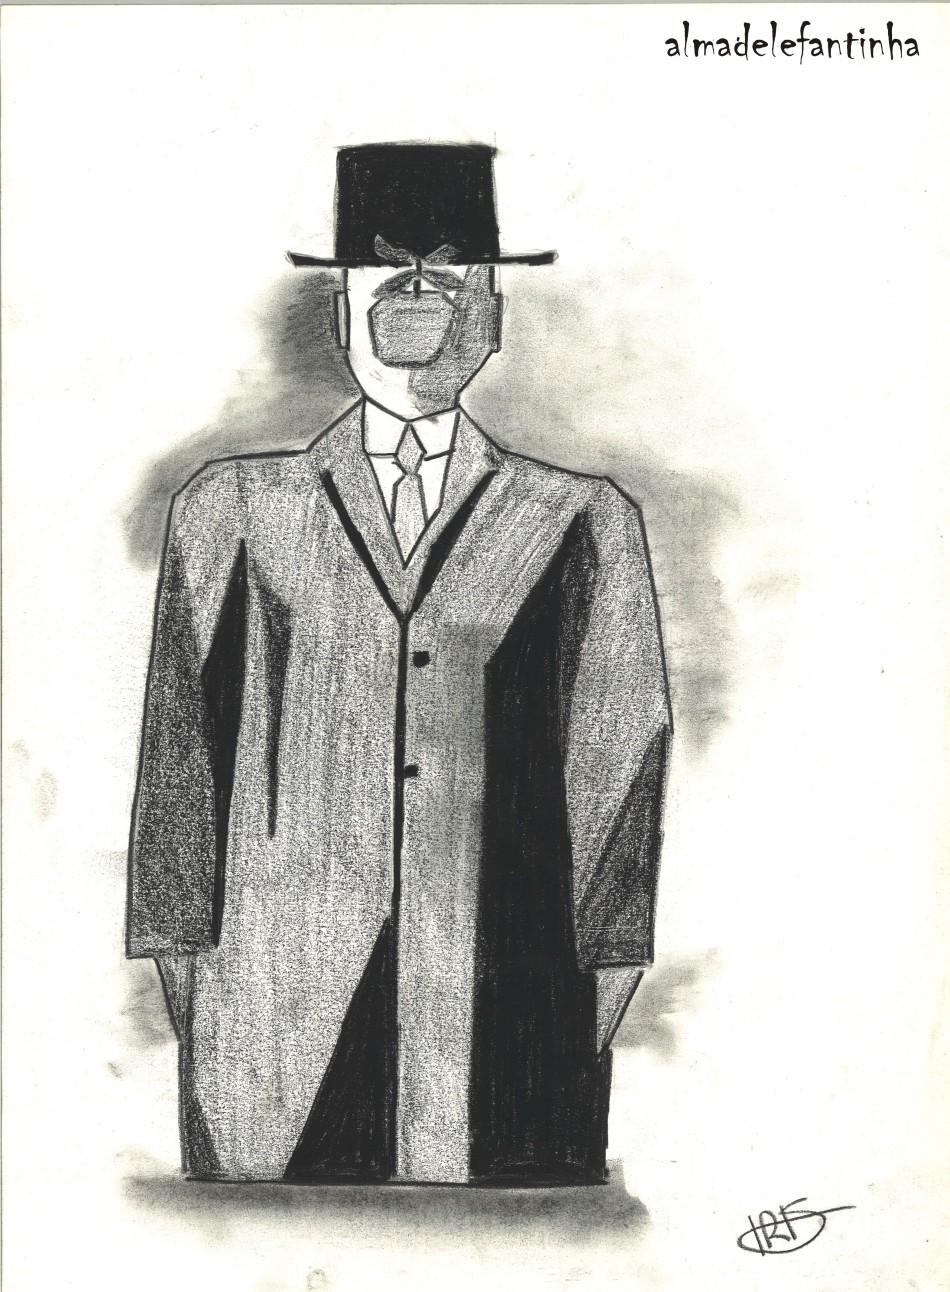 El hijo del hombre - René Magritte-reinterpretacion_almadelefantinha